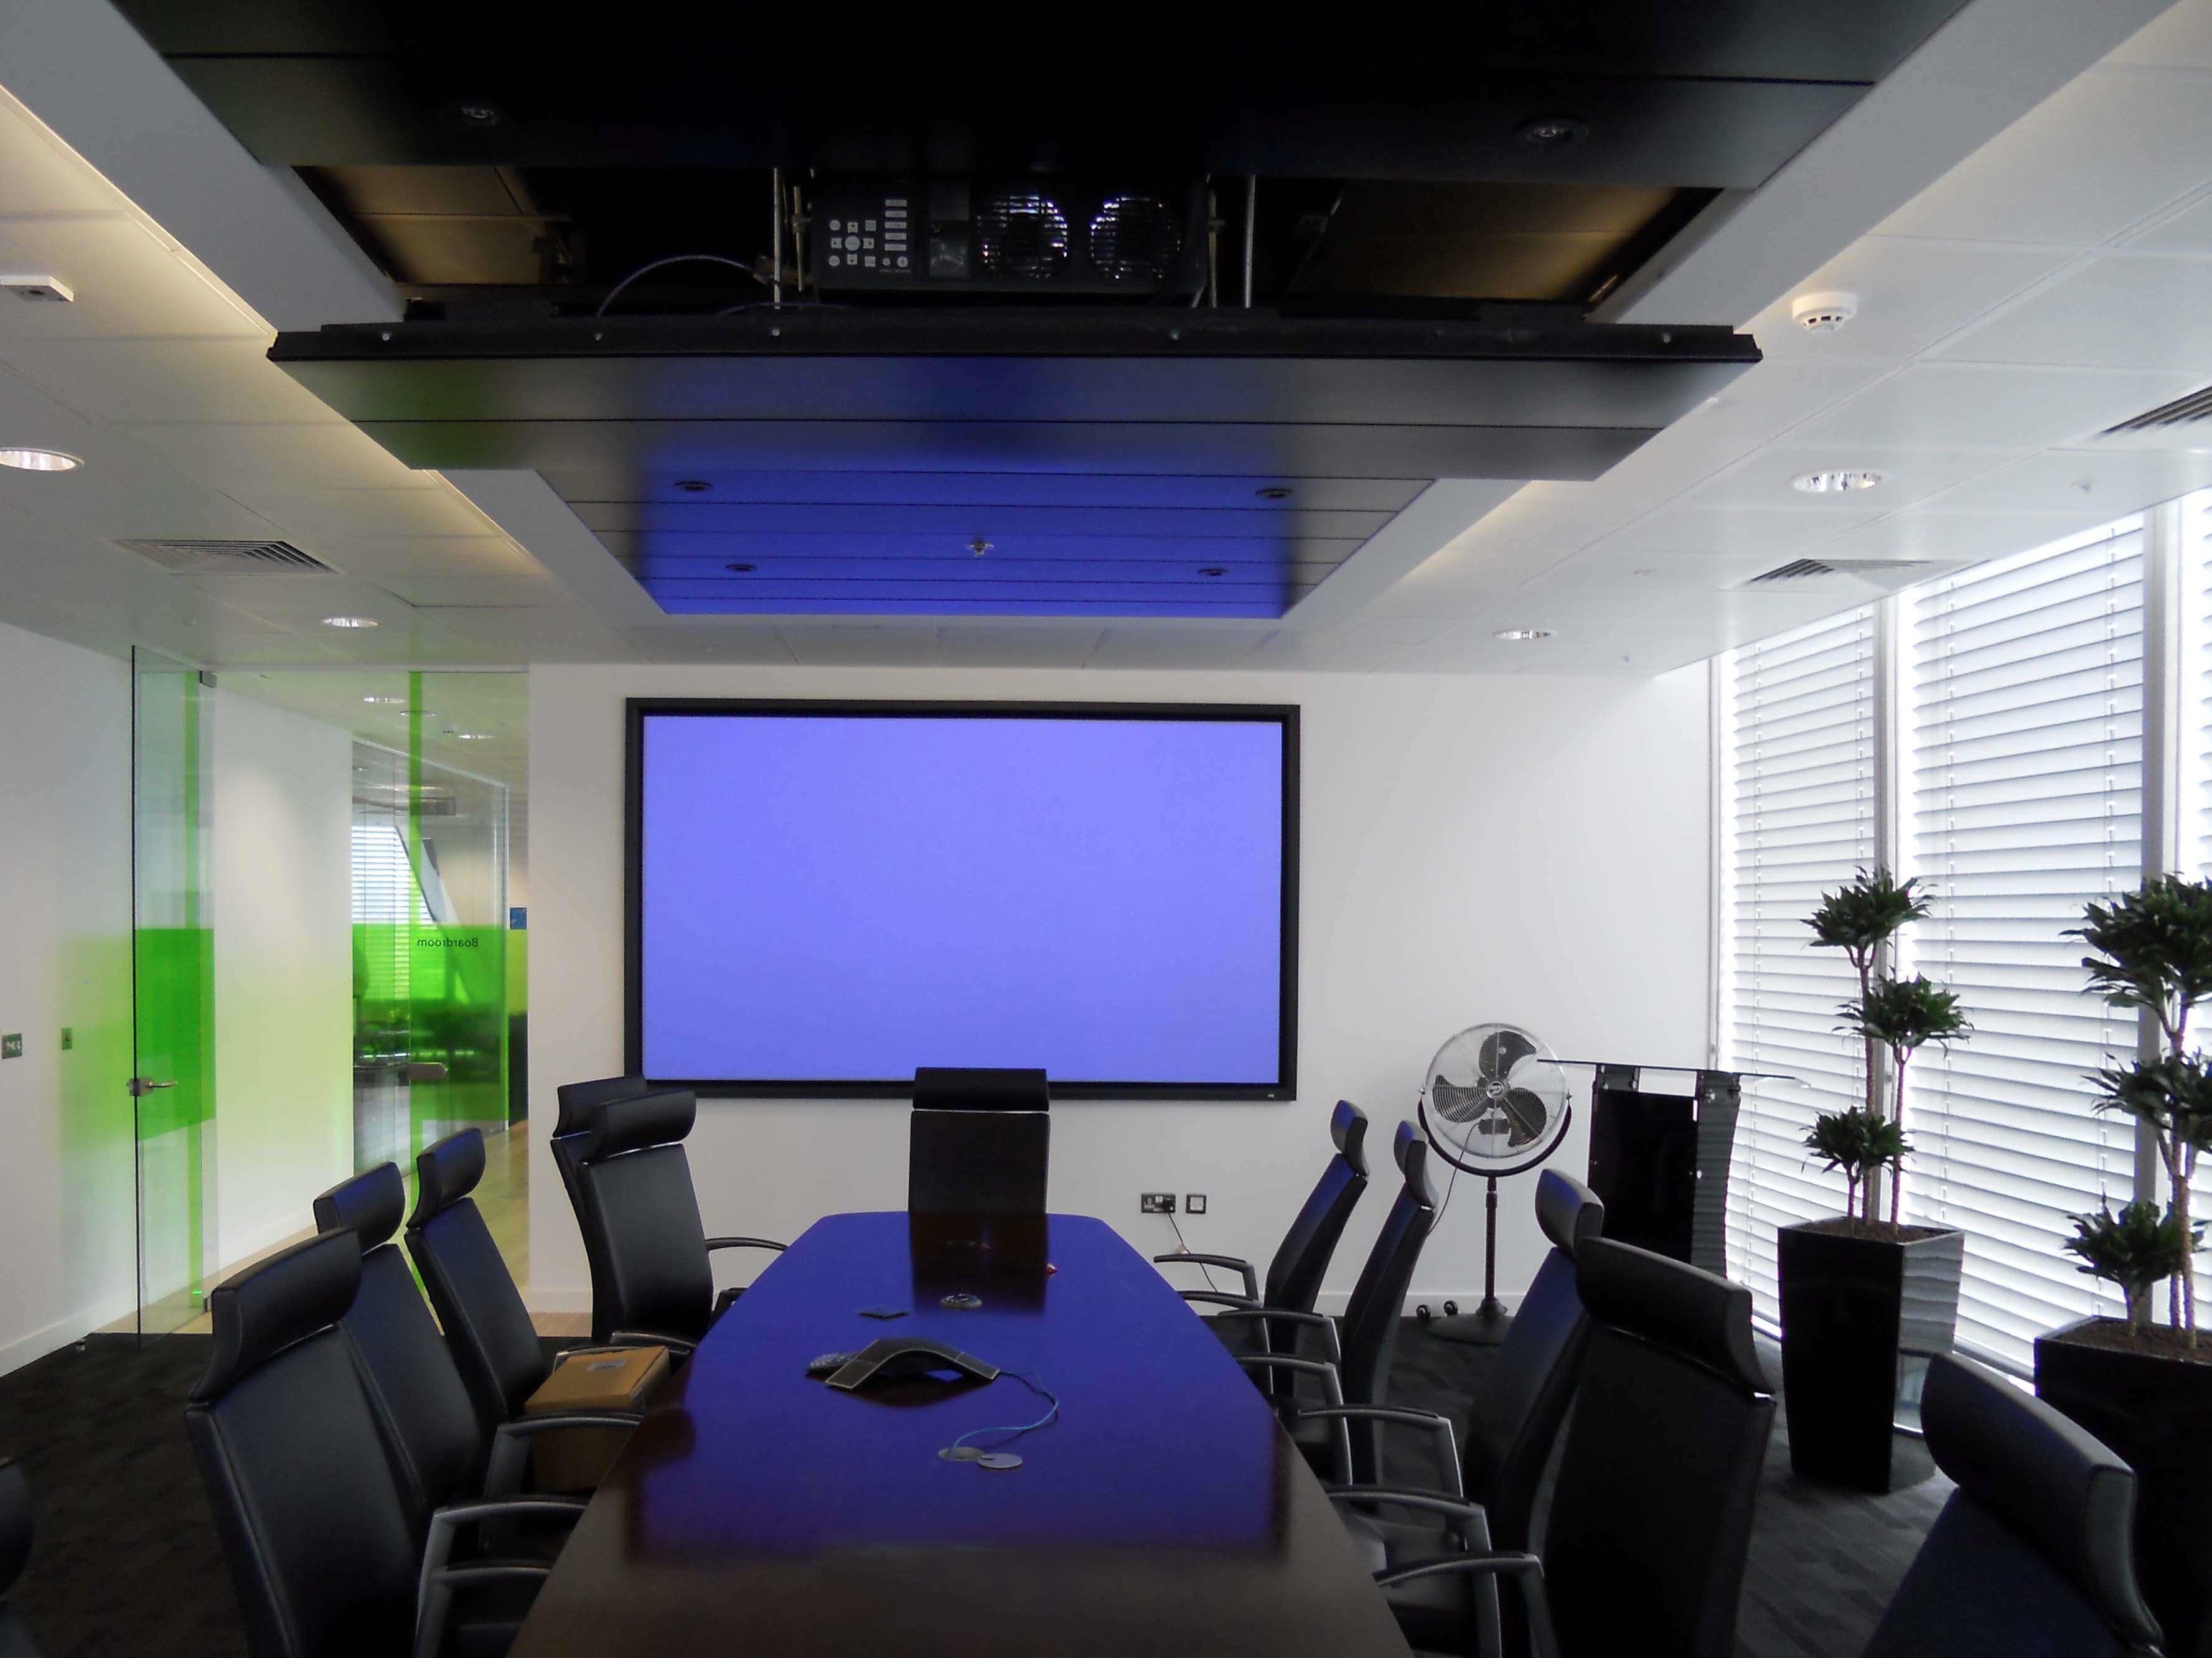 Mitsubishi Electric Remote >> Projector Gallery | Master AV Services